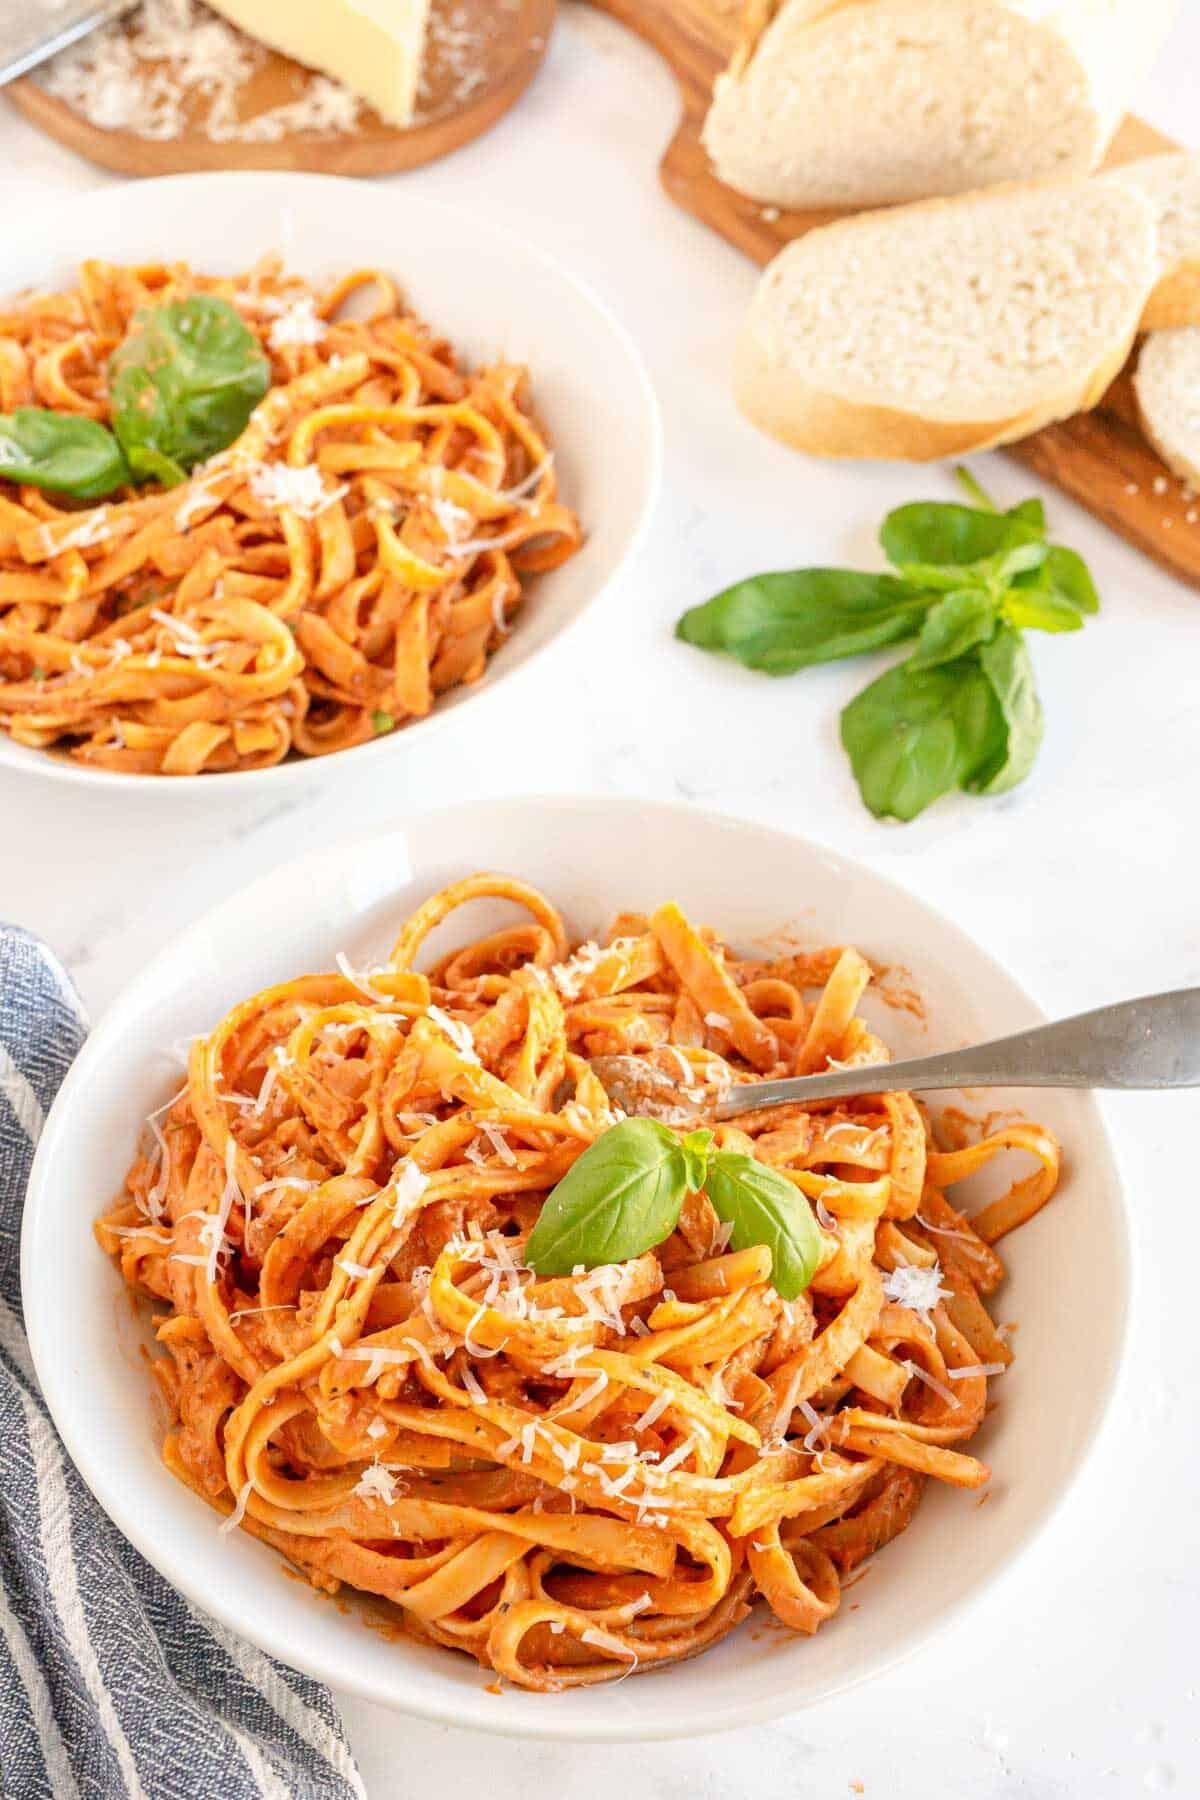 tomato cream sauce on pasta with basil